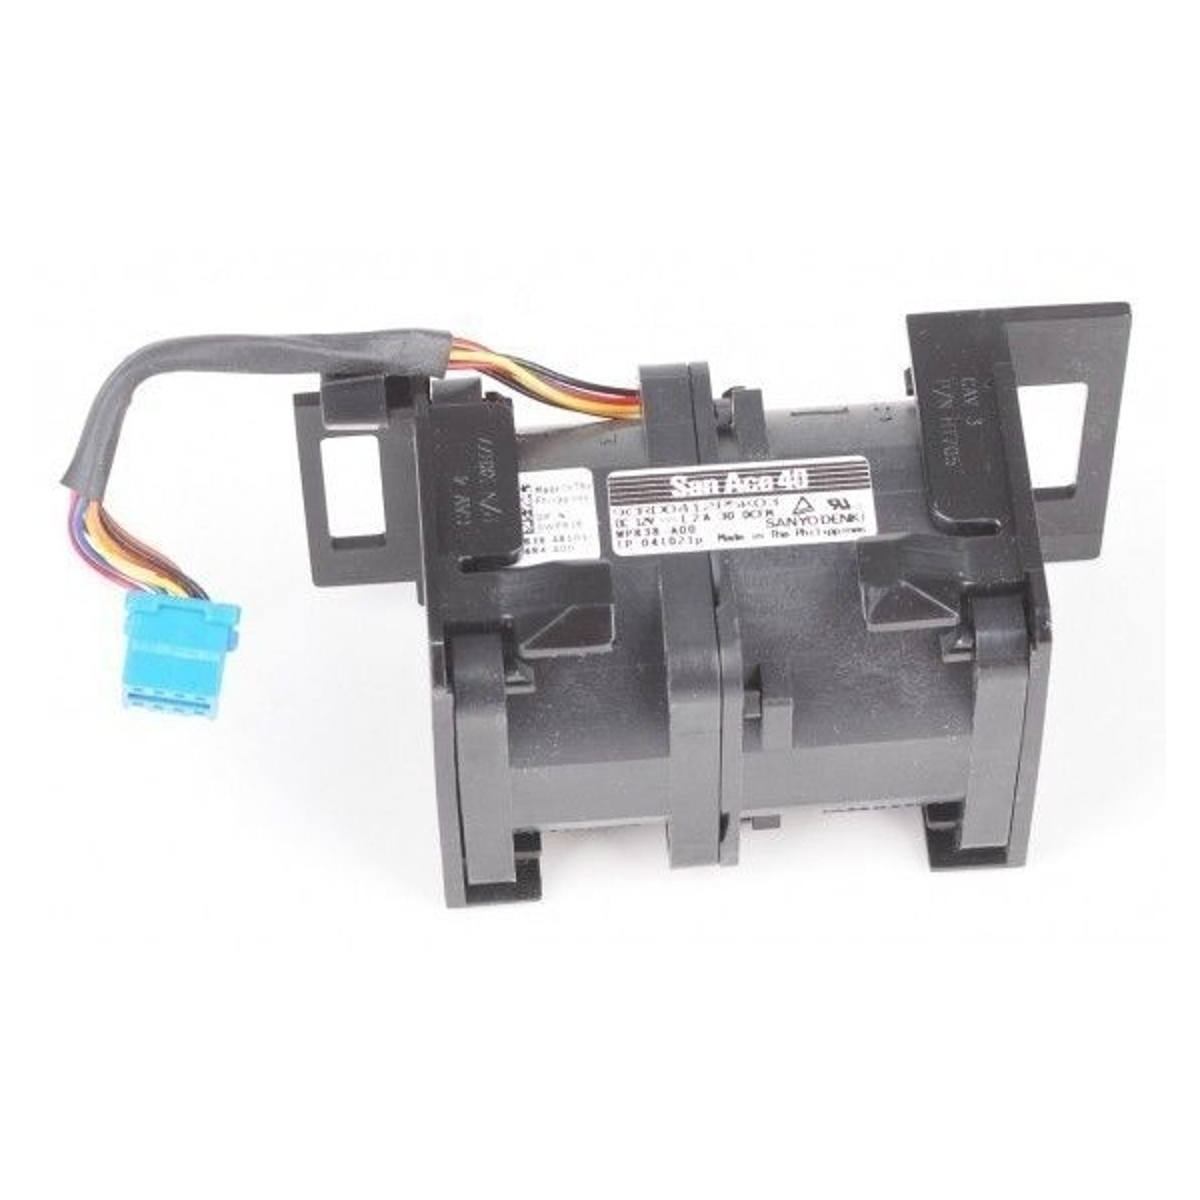 Ventilator - PowerEdge R610 - 0WW2YY, WW2YY - 1 - Ventilator (Fan) - 91,39lei